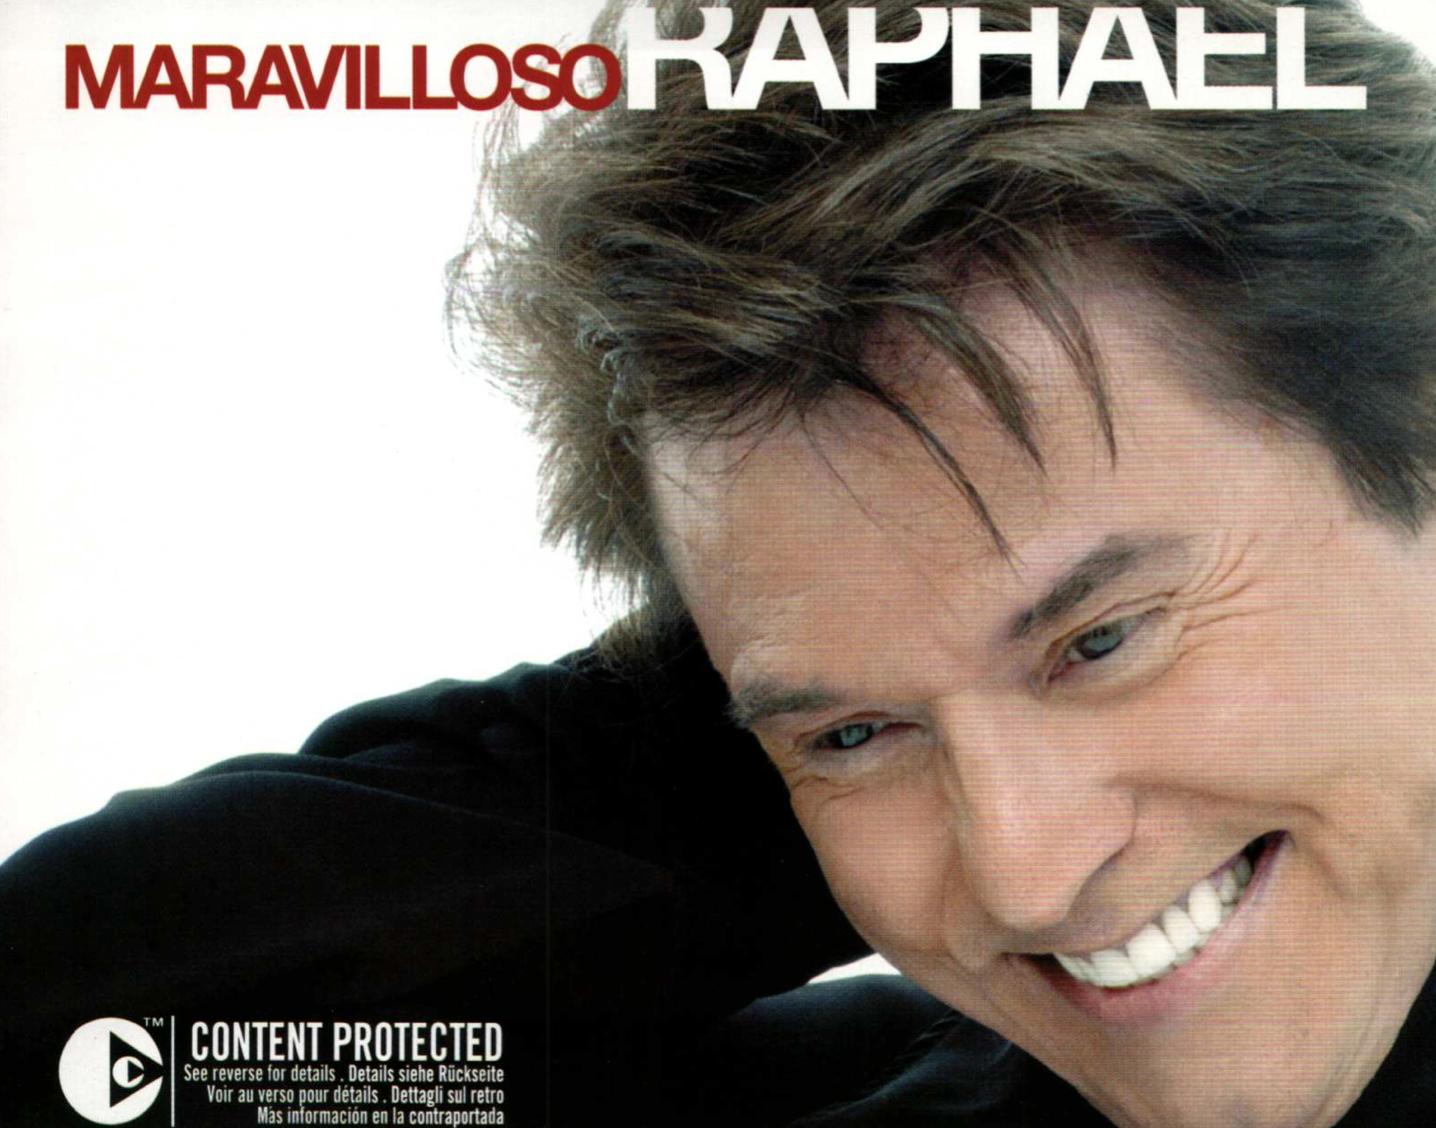 RAPHAEL _MARAVILLOSO_